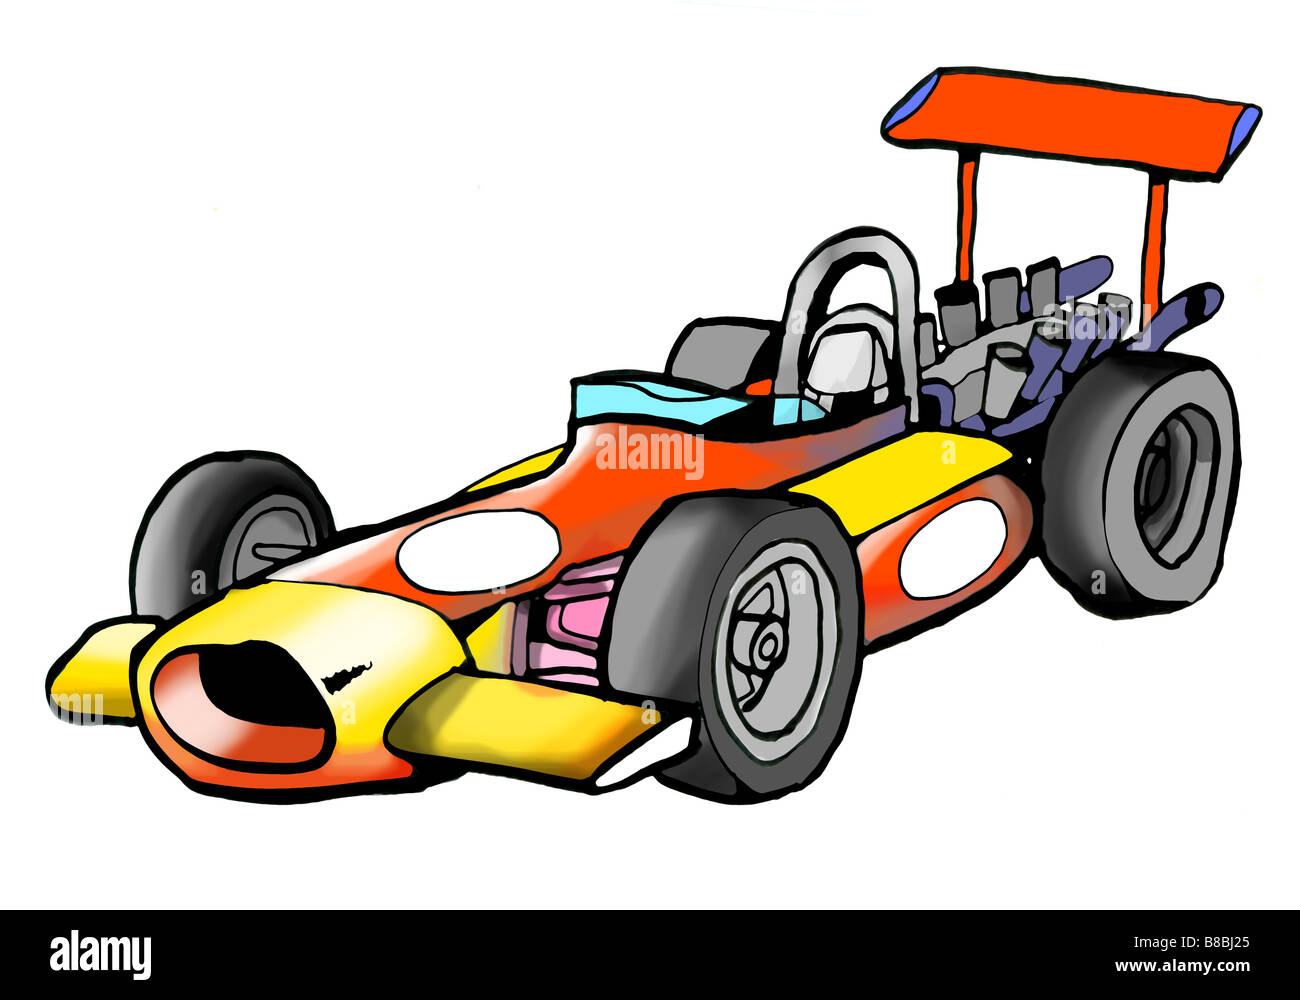 Cut Out Illustration Of A Vintage Formula Race Car Stock Photo